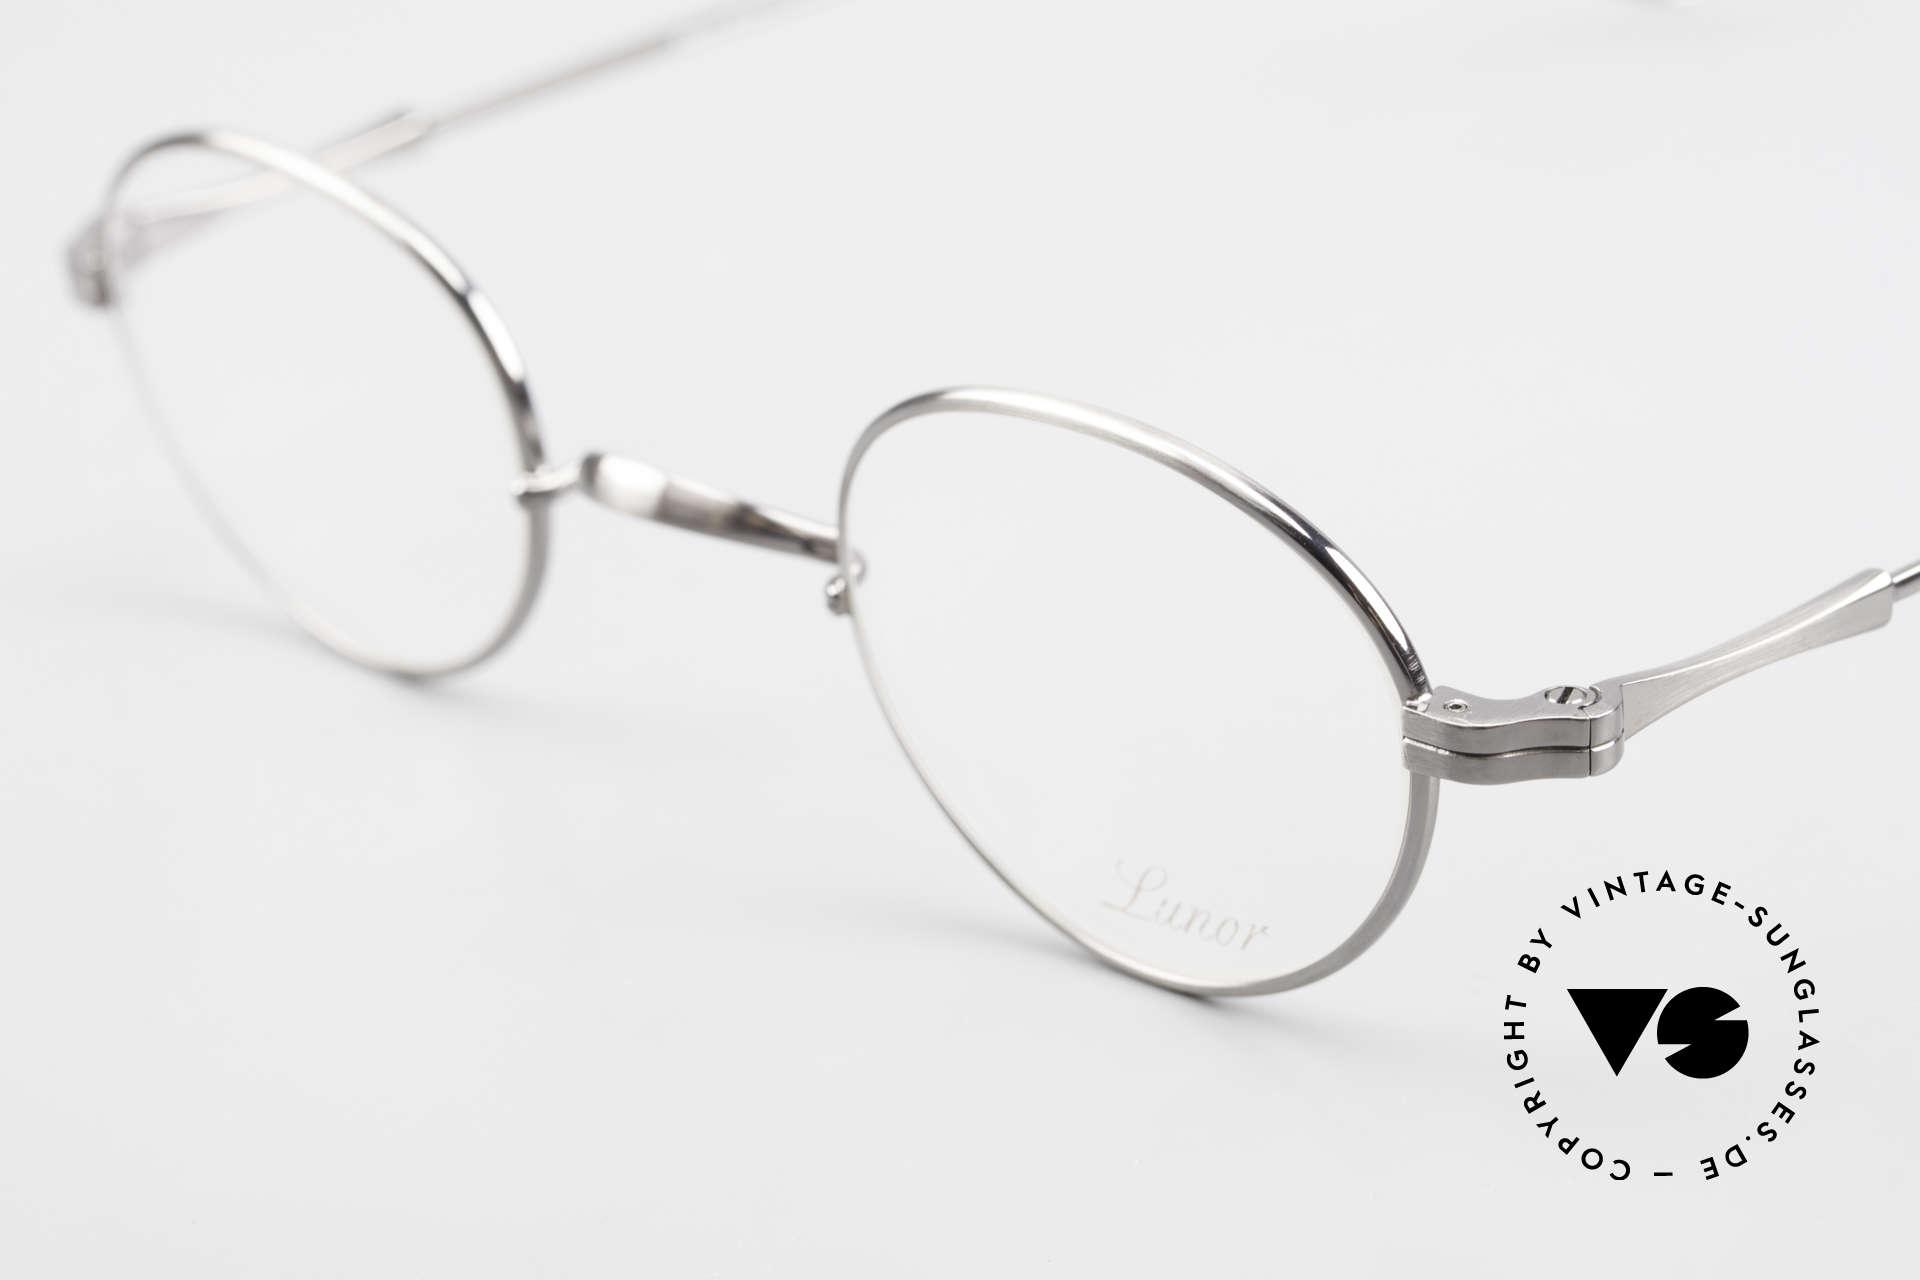 Lunor II 20 Lunor Eyeglasses Unisex Small, noble, classy, timeless = a genuine LUNOR ORIGINAL!, Made for Men and Women